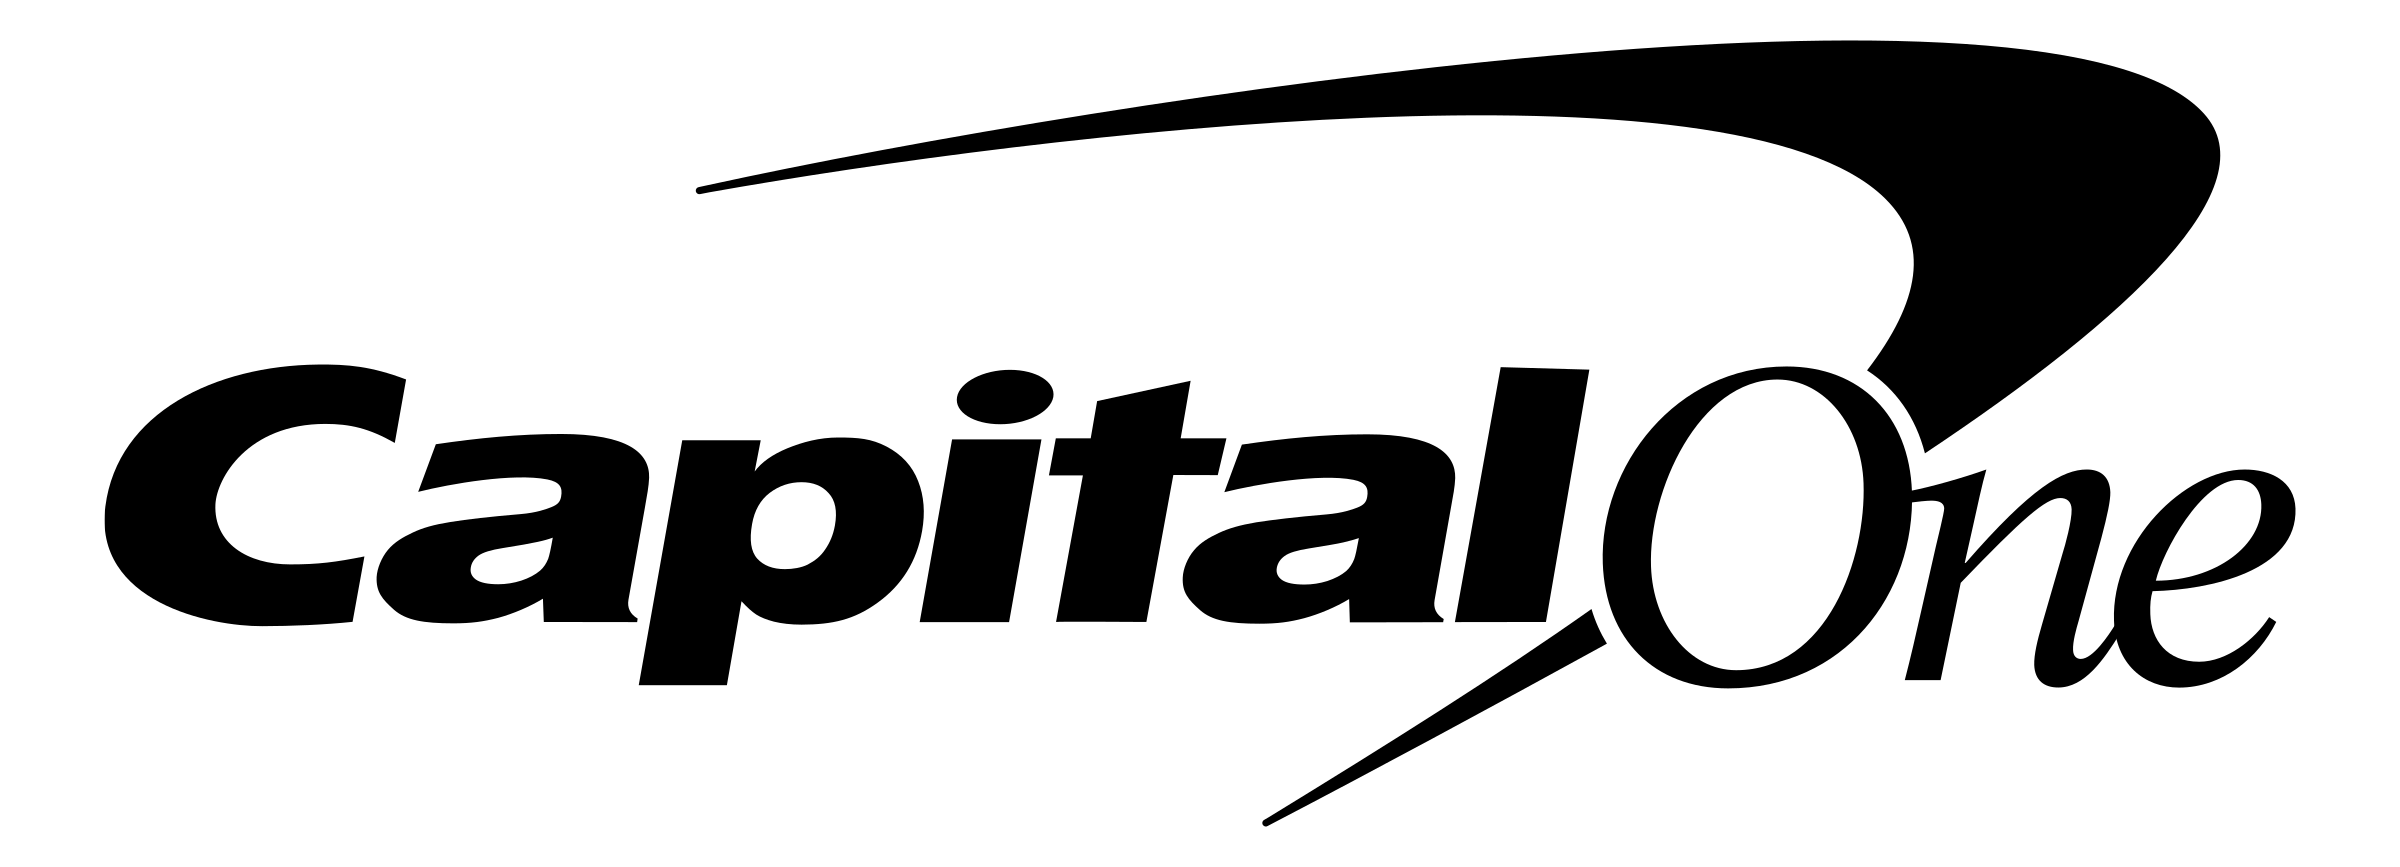 capital-one-logo-black-transparent.png